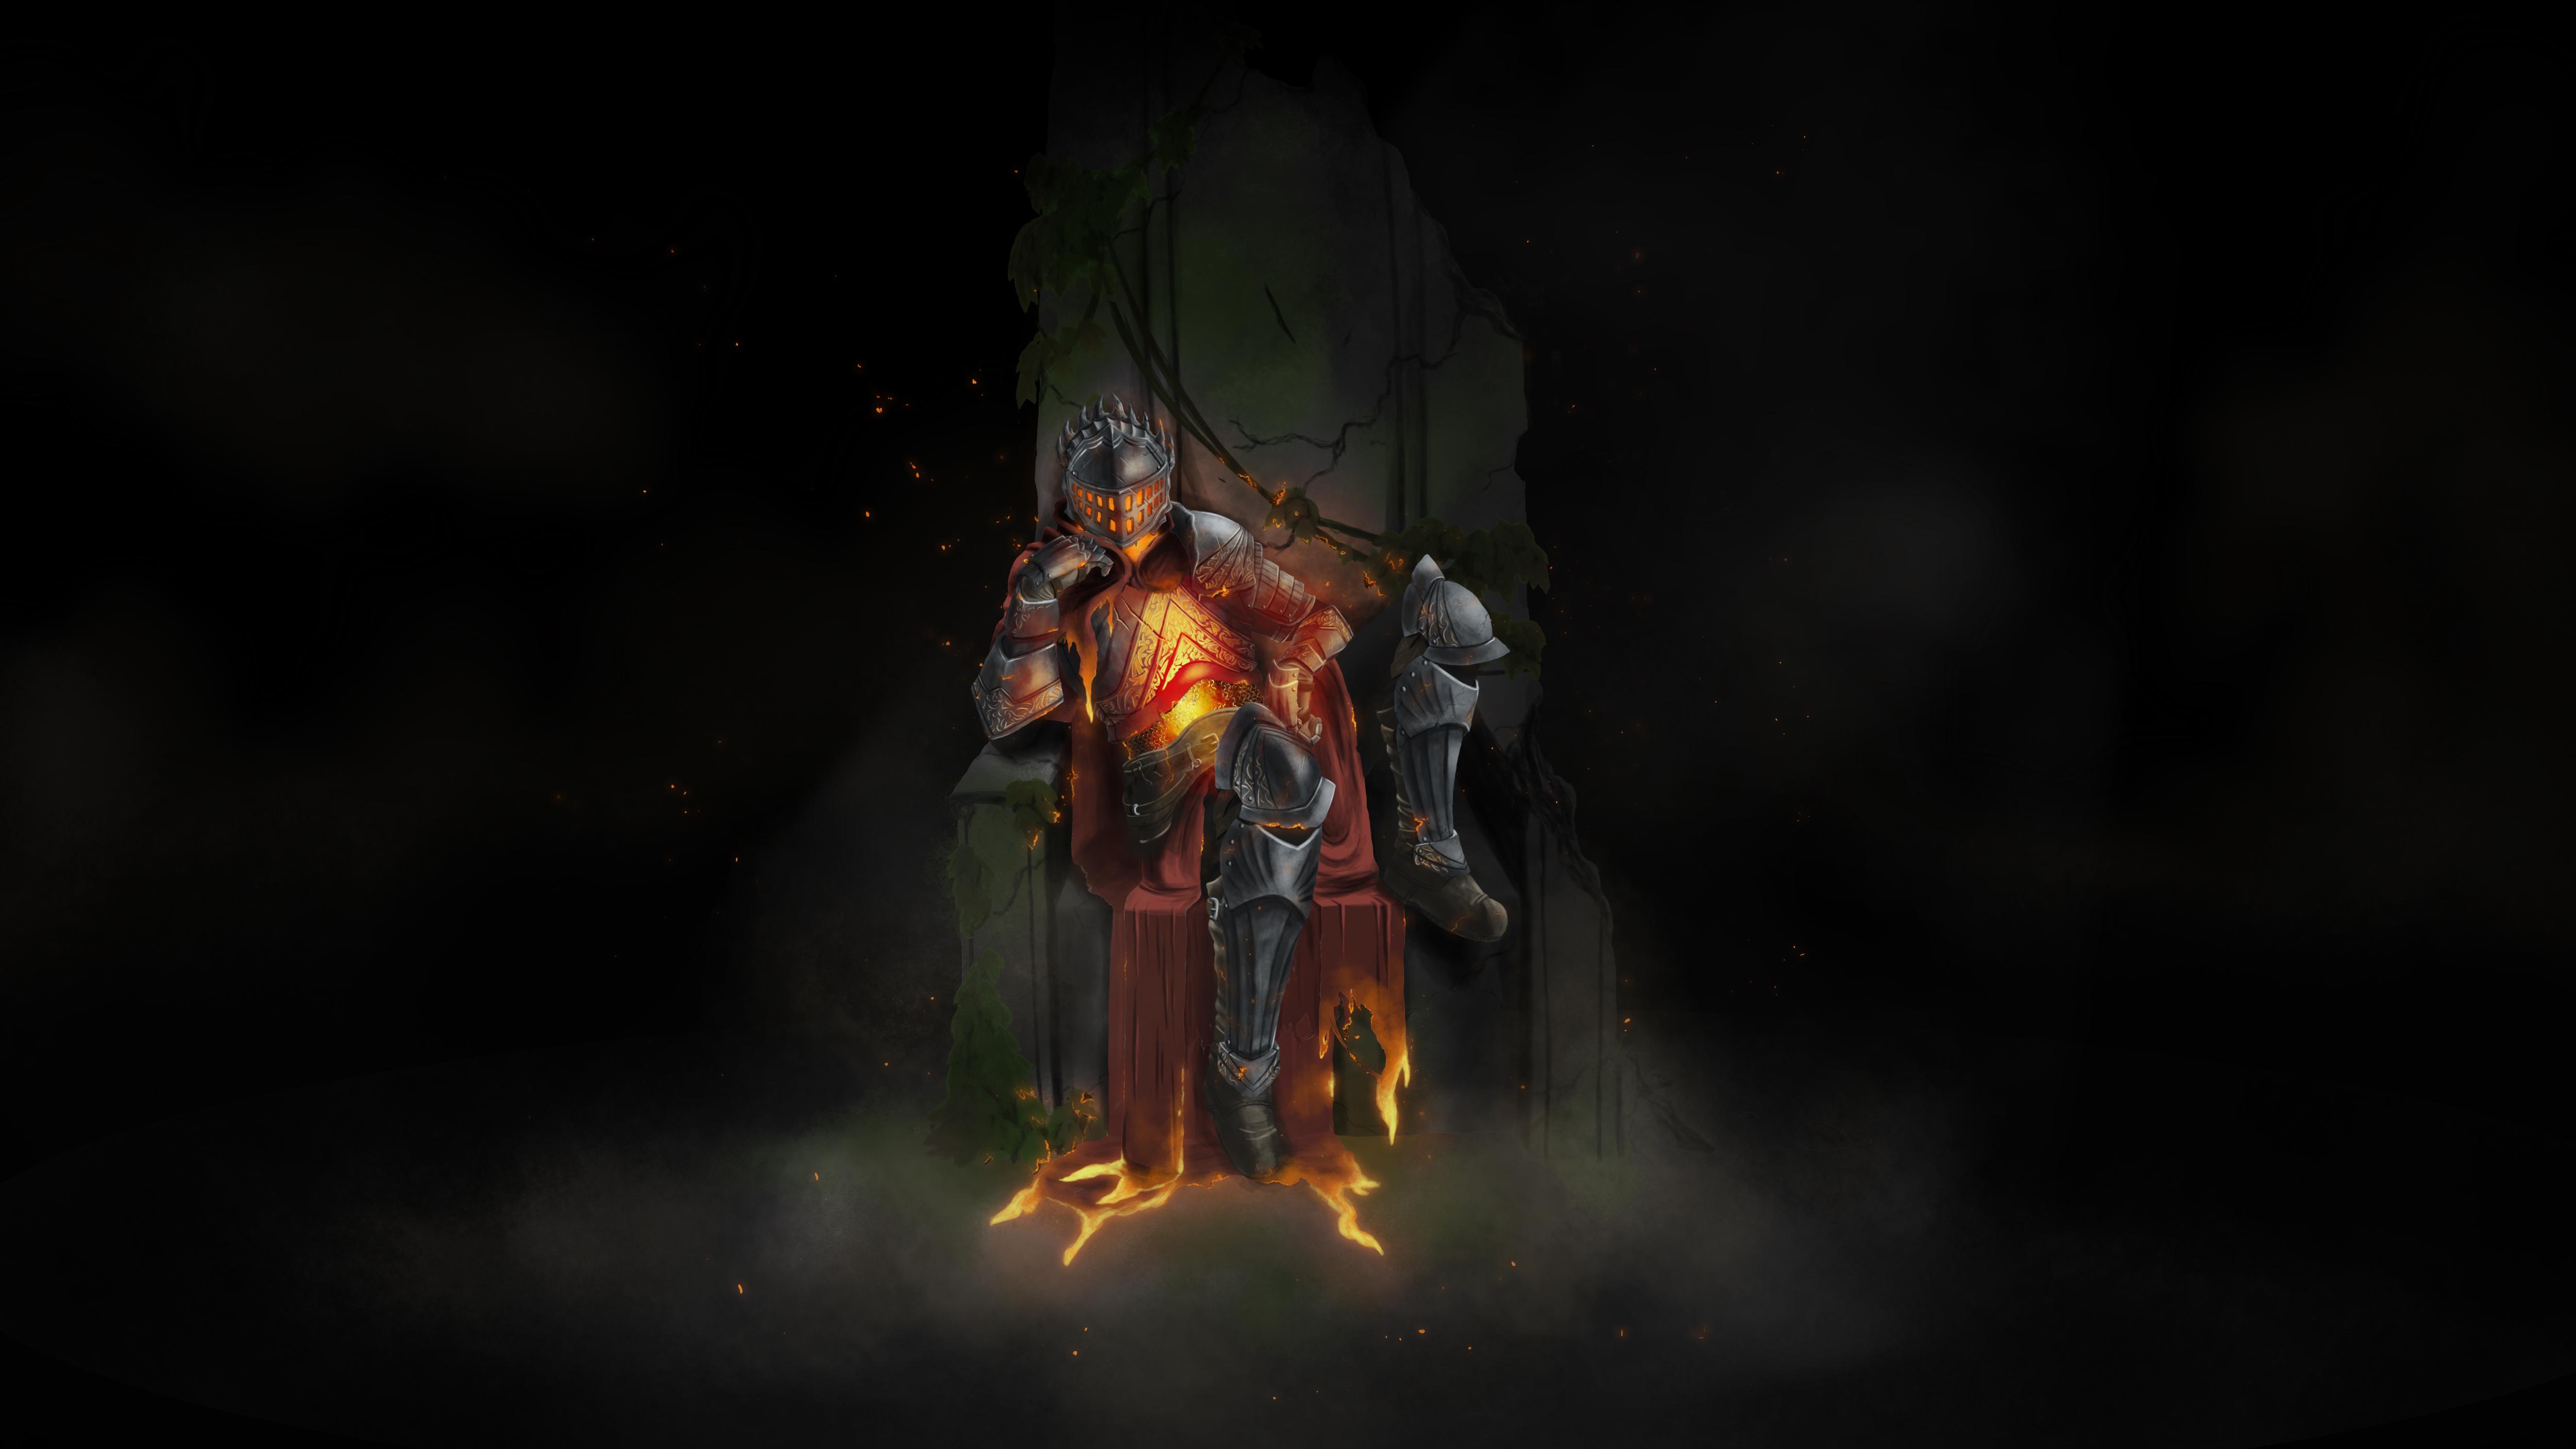 Soul Of Cinder Fan Art: Lord Of Cinder By Tosthage On DeviantArt